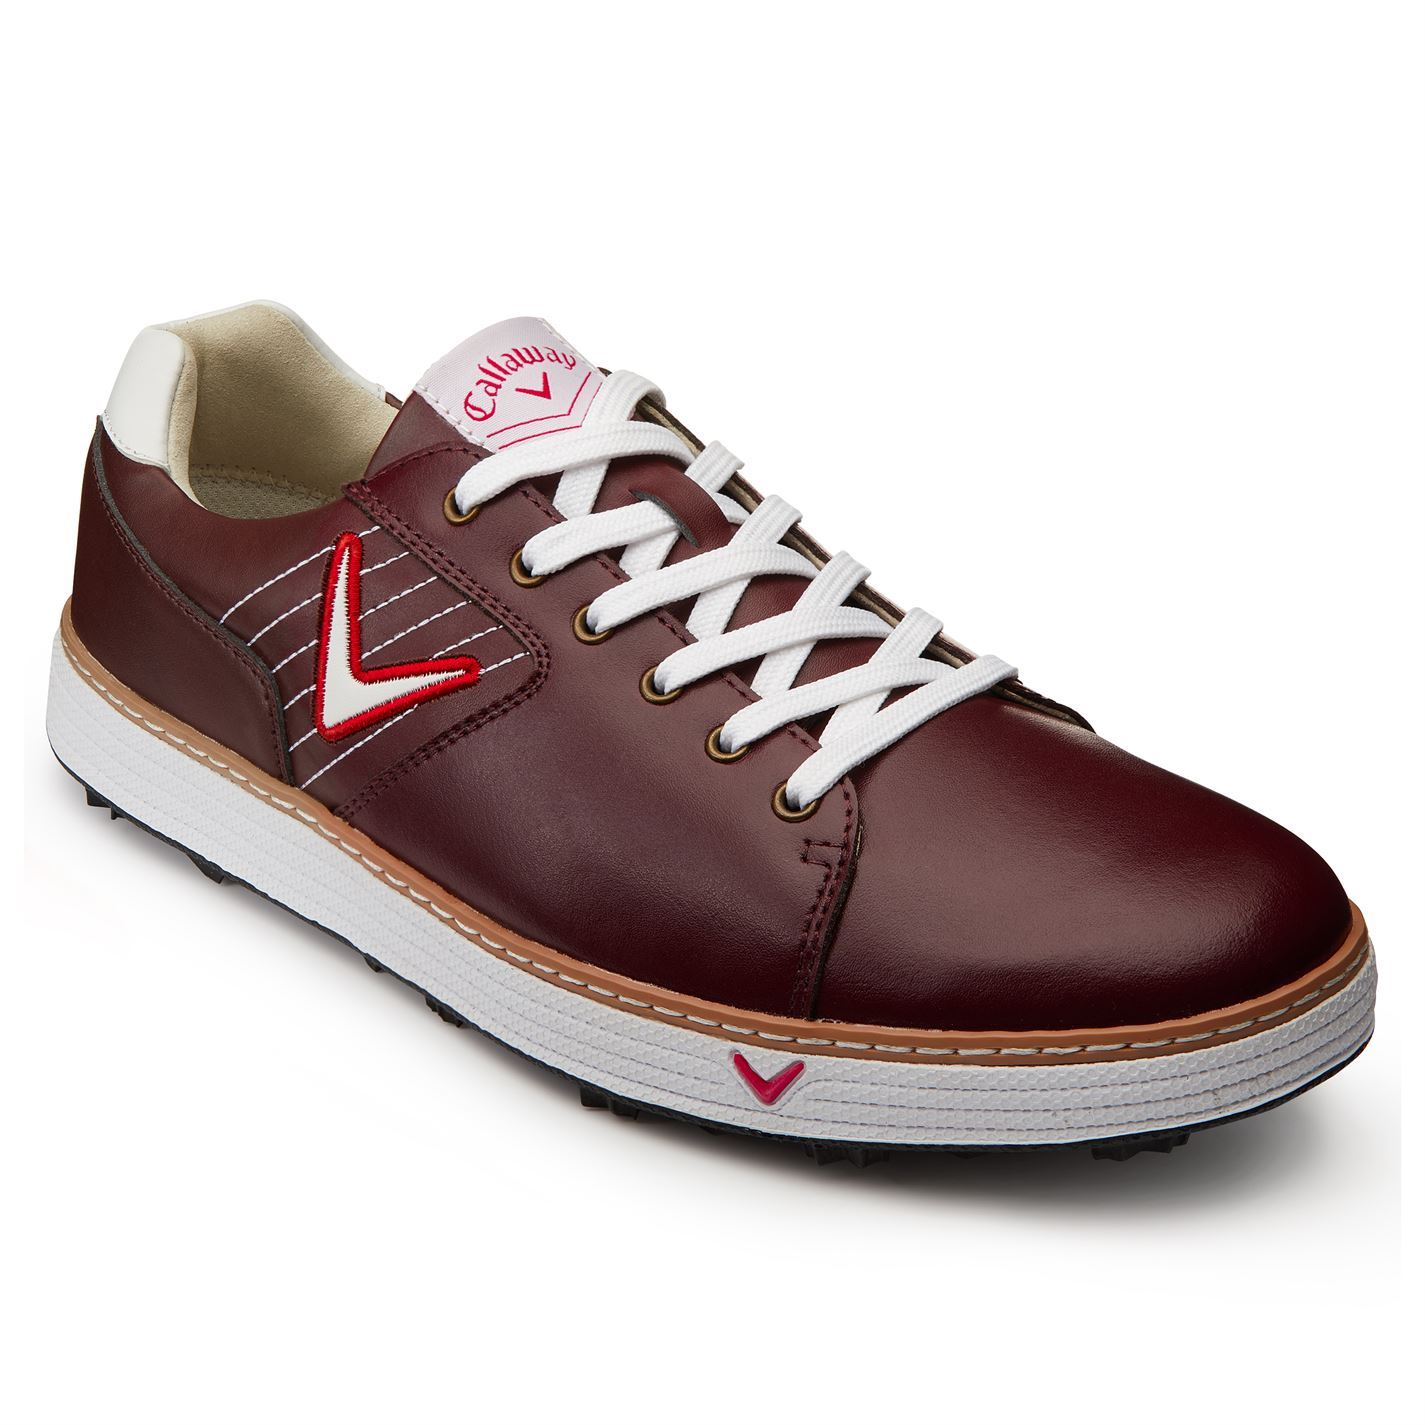 Callaway-Delmar-Urban-Golf-Shoes-Mens-Spikeless-Footwear thumbnail 4